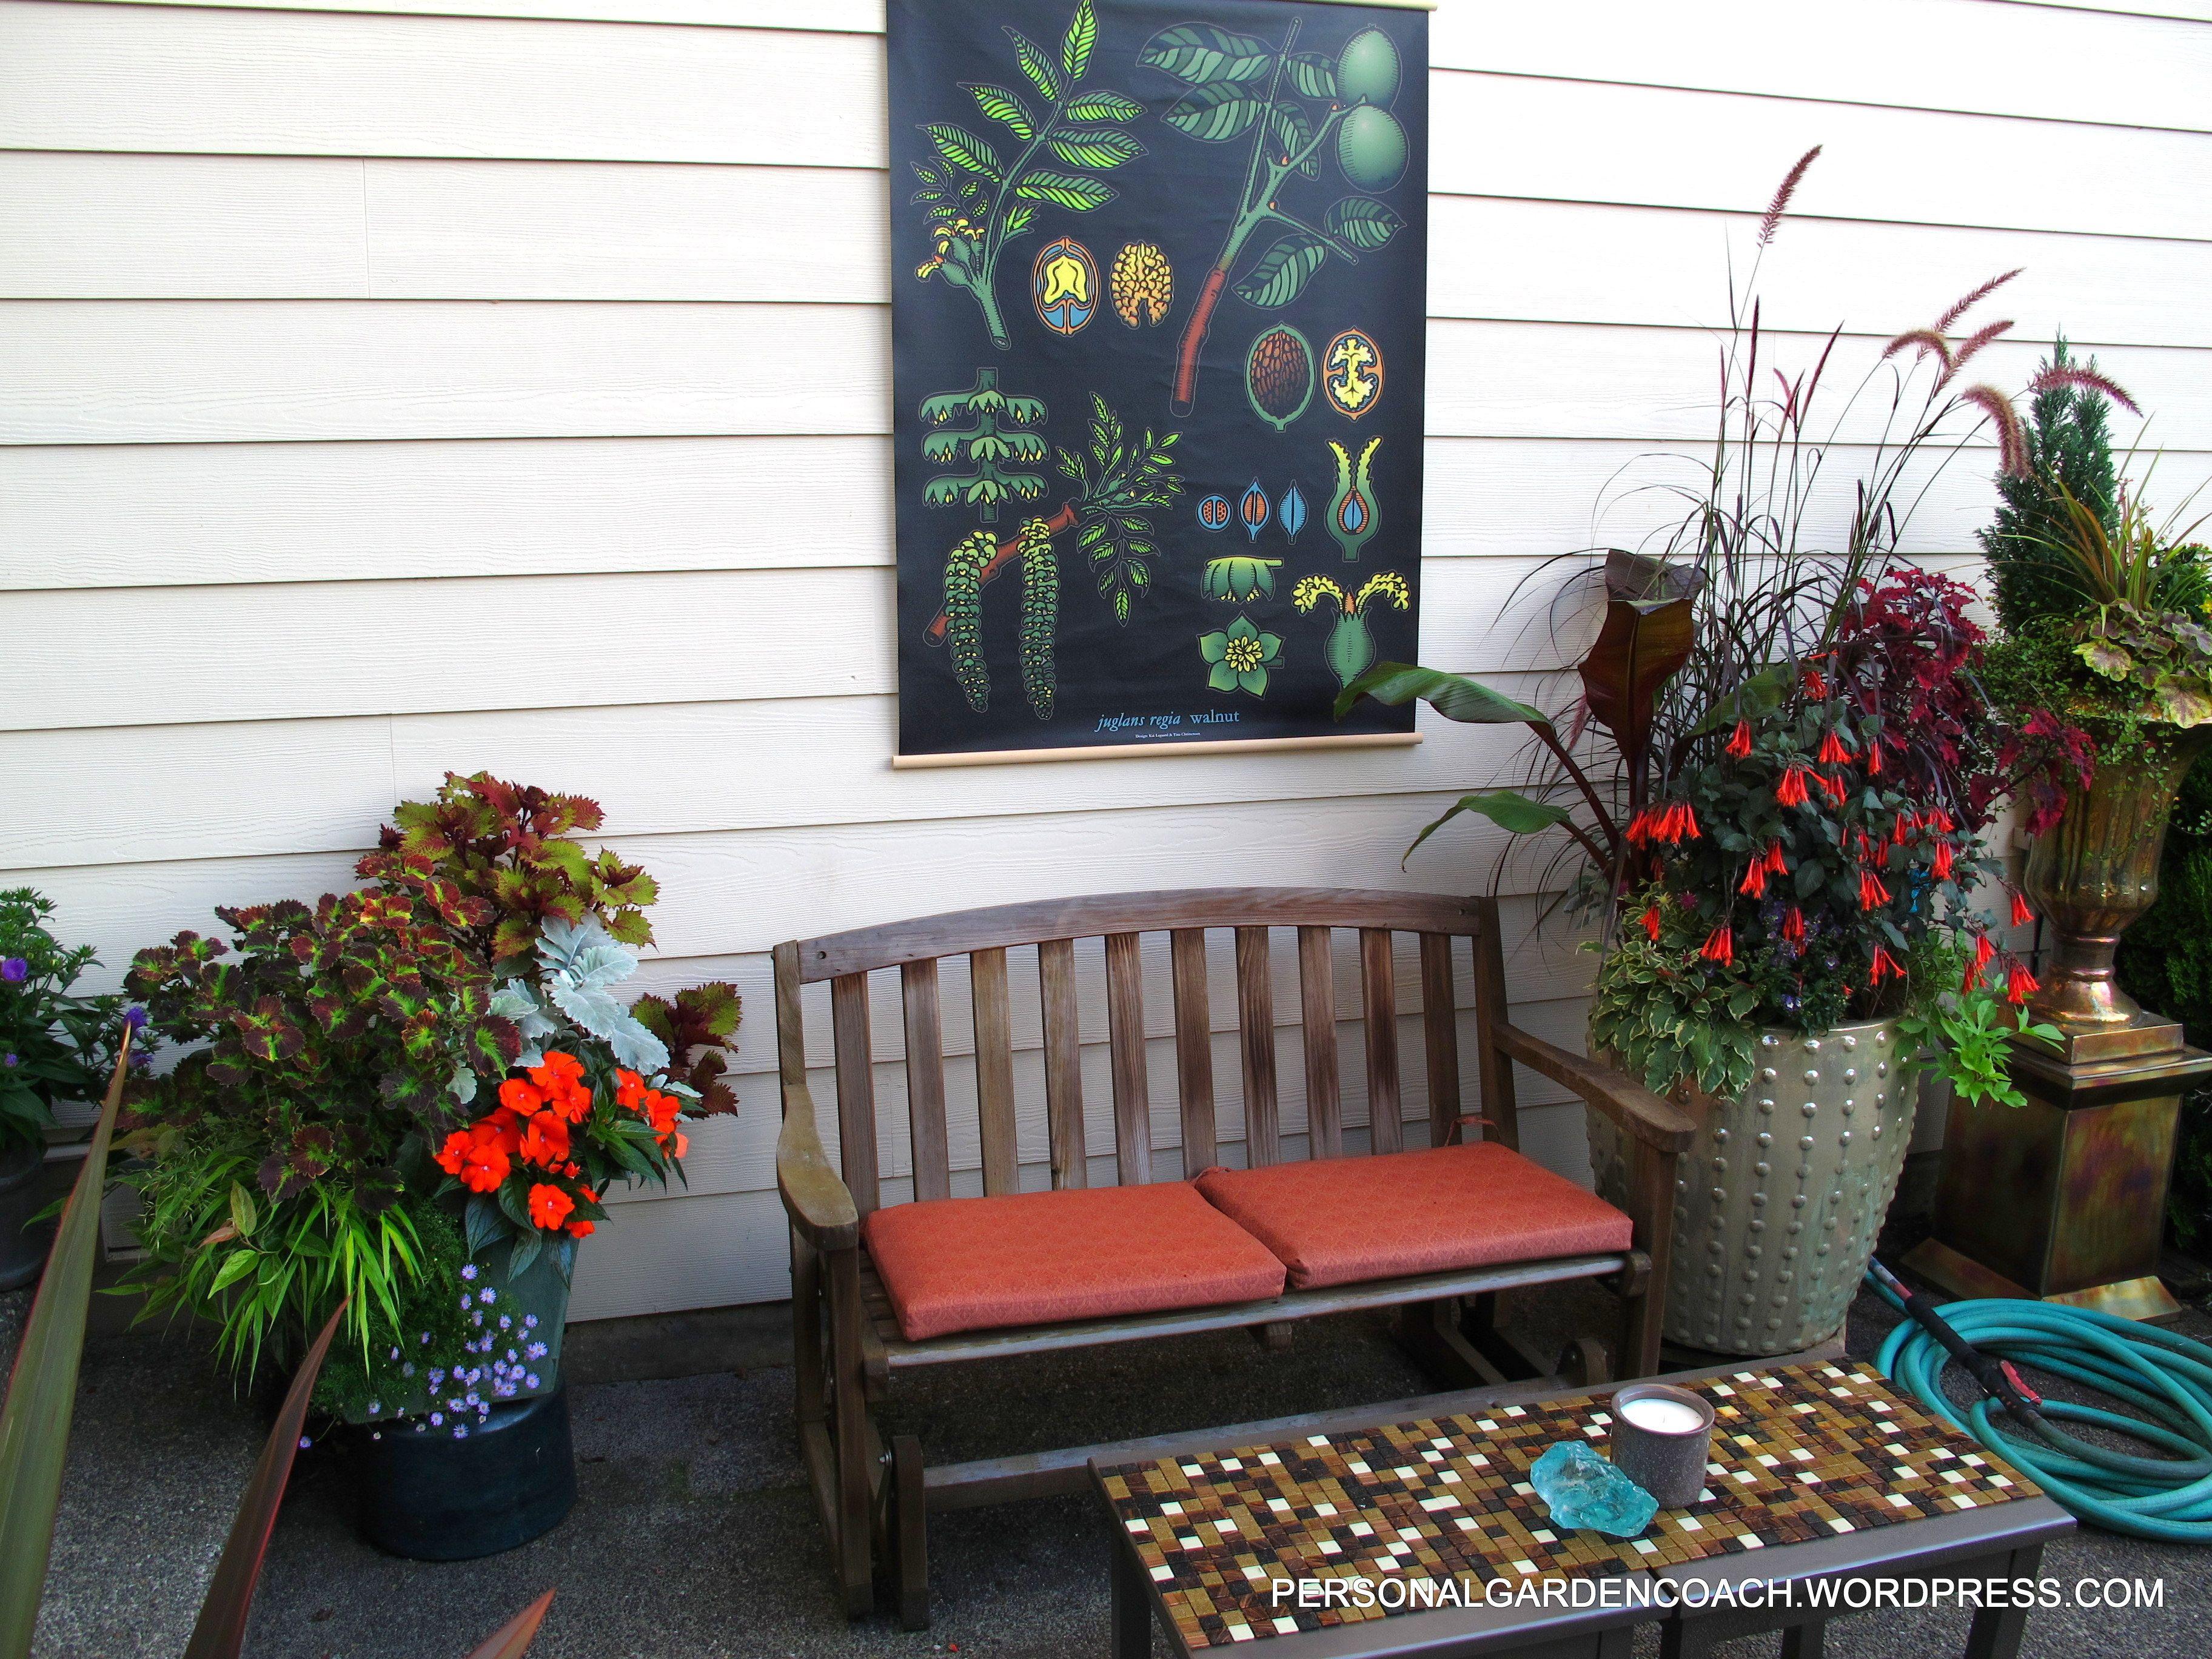 Imgg garden planning pinterest garden